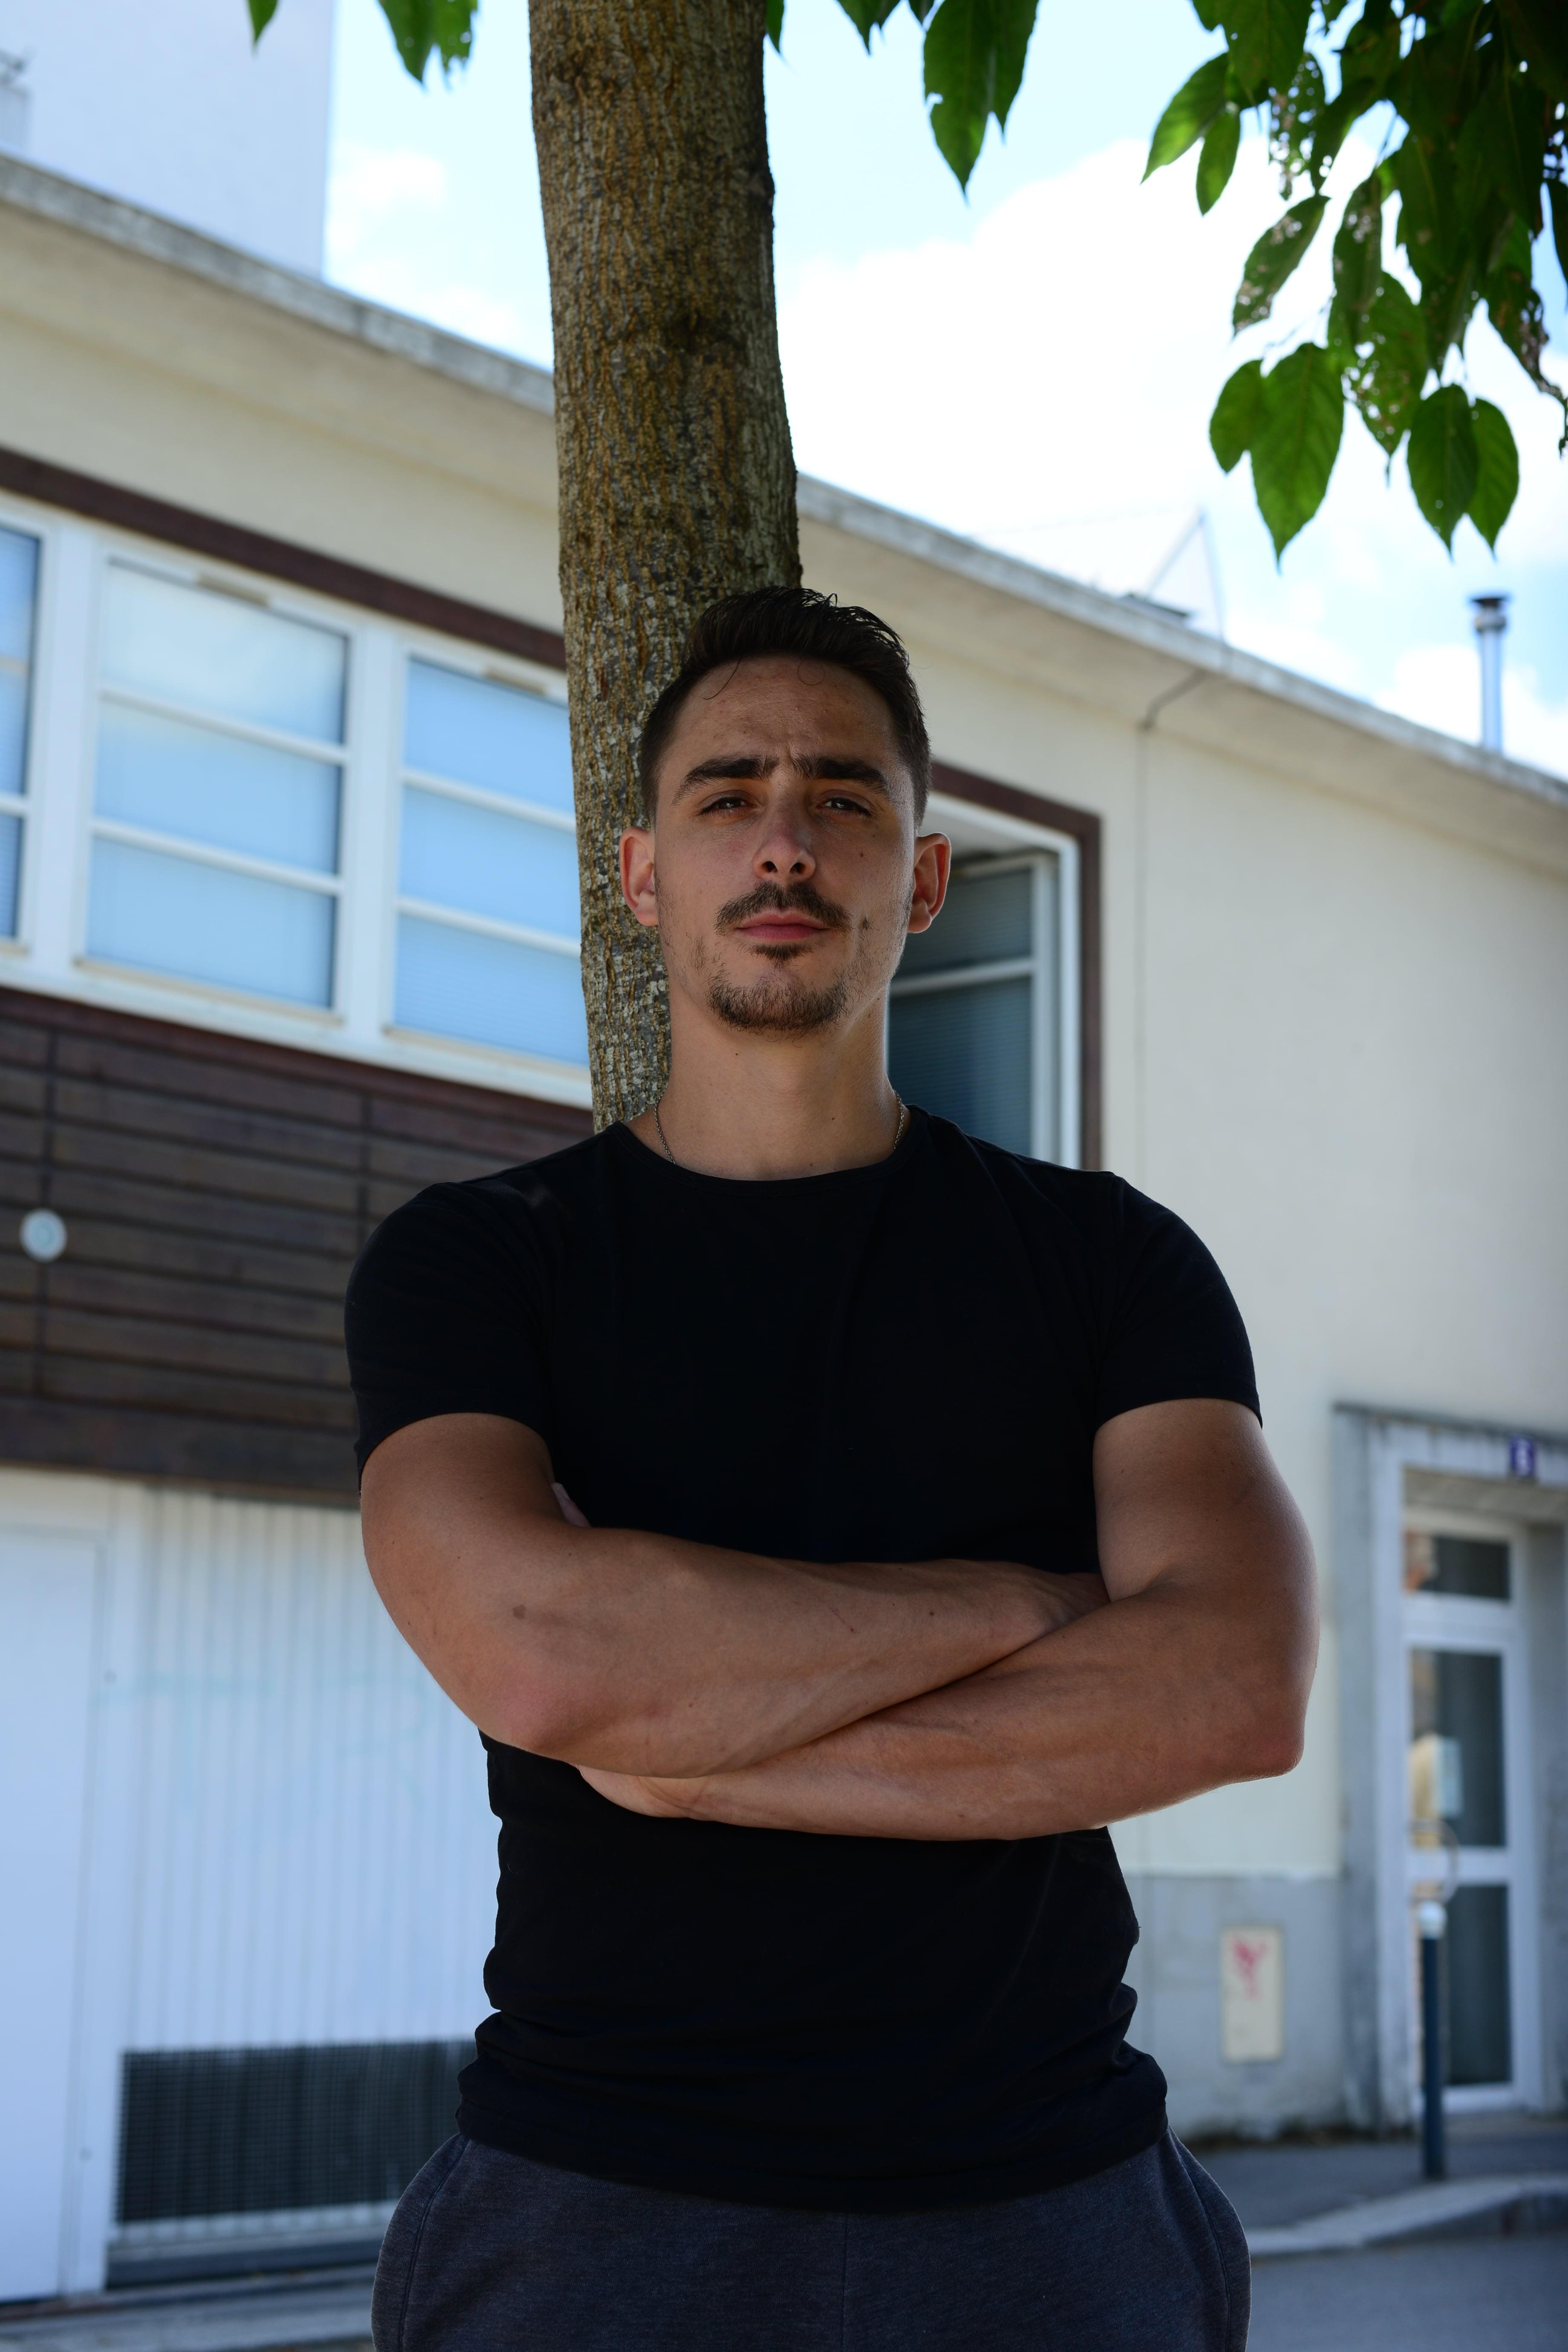 Adrien Heuzé